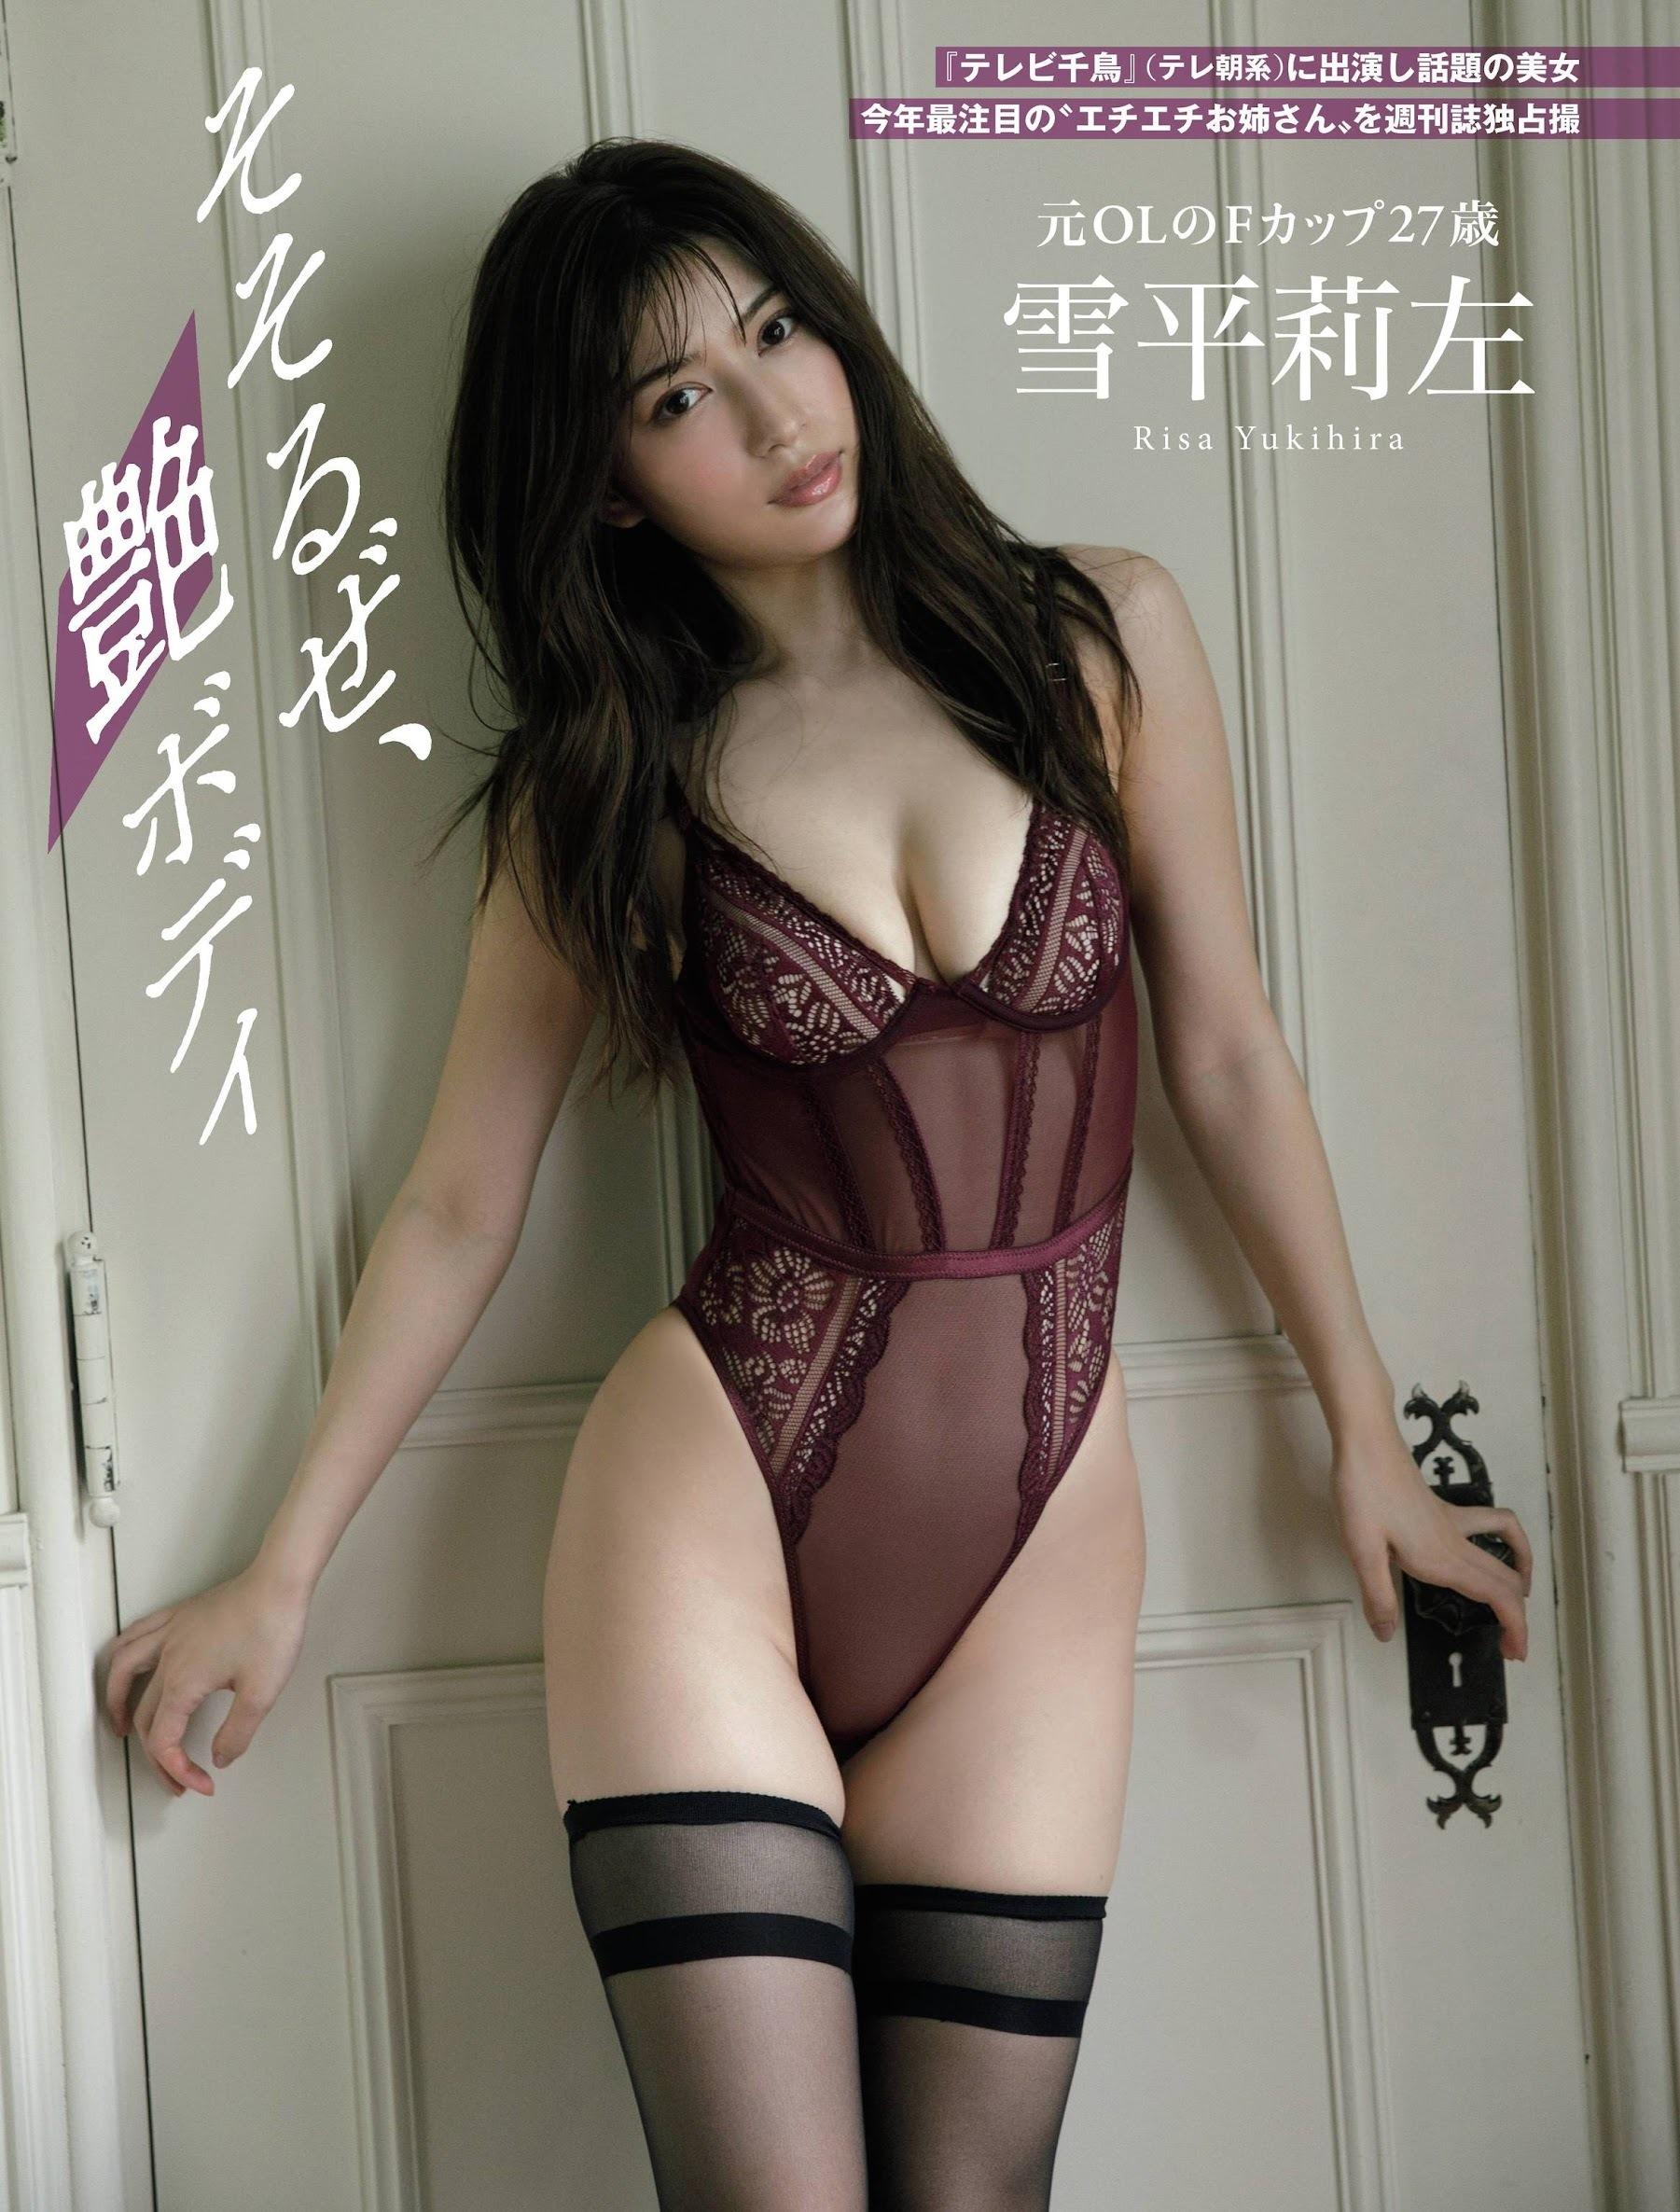 enako 雪平莉左-FLASH 2021年9月14日刊 高清套图 第16张